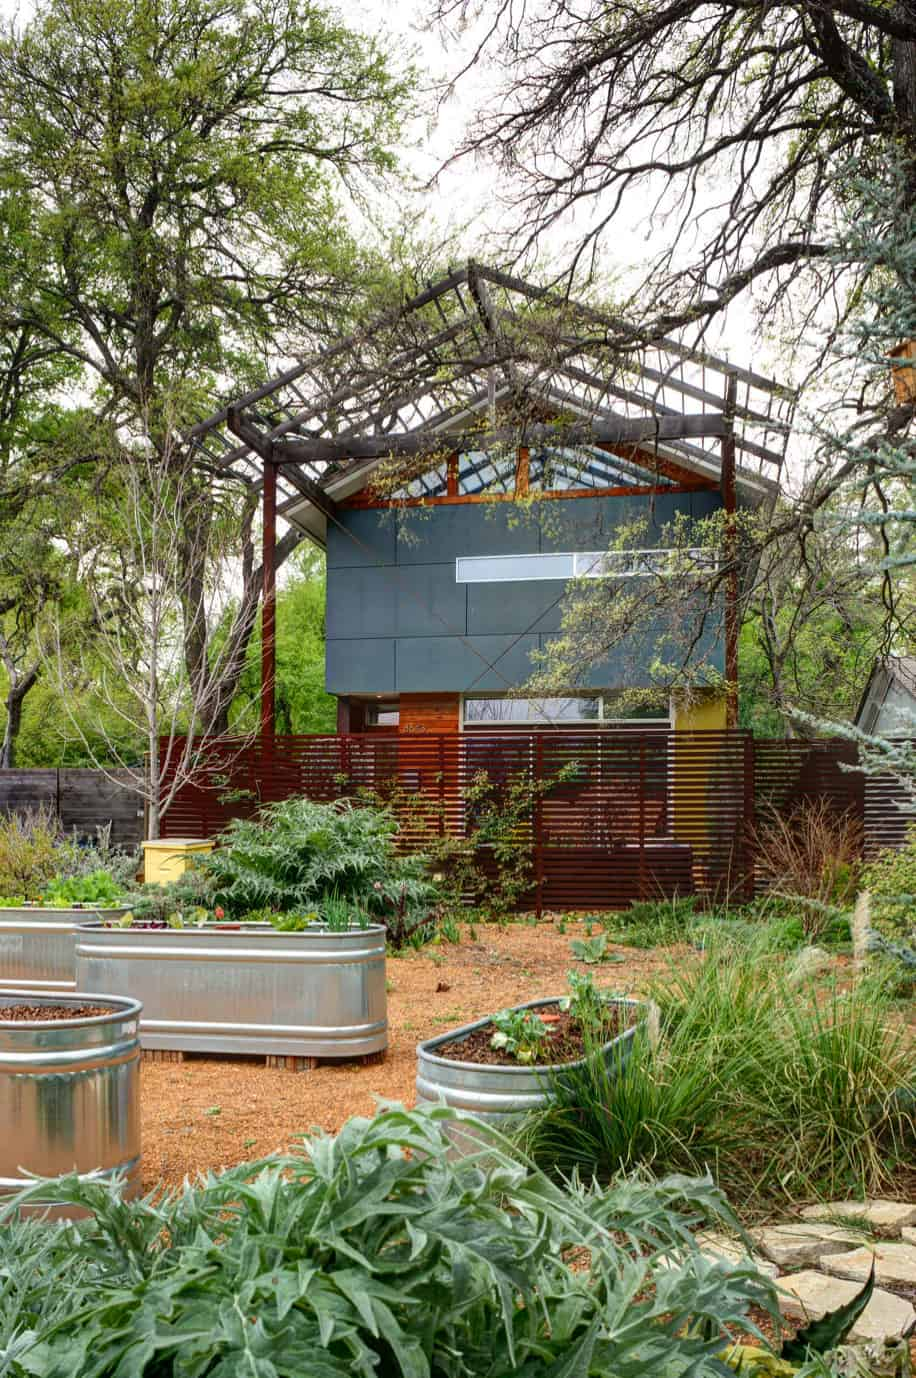 inspiring-vegetable-garden-ideas-metal-trough-planters